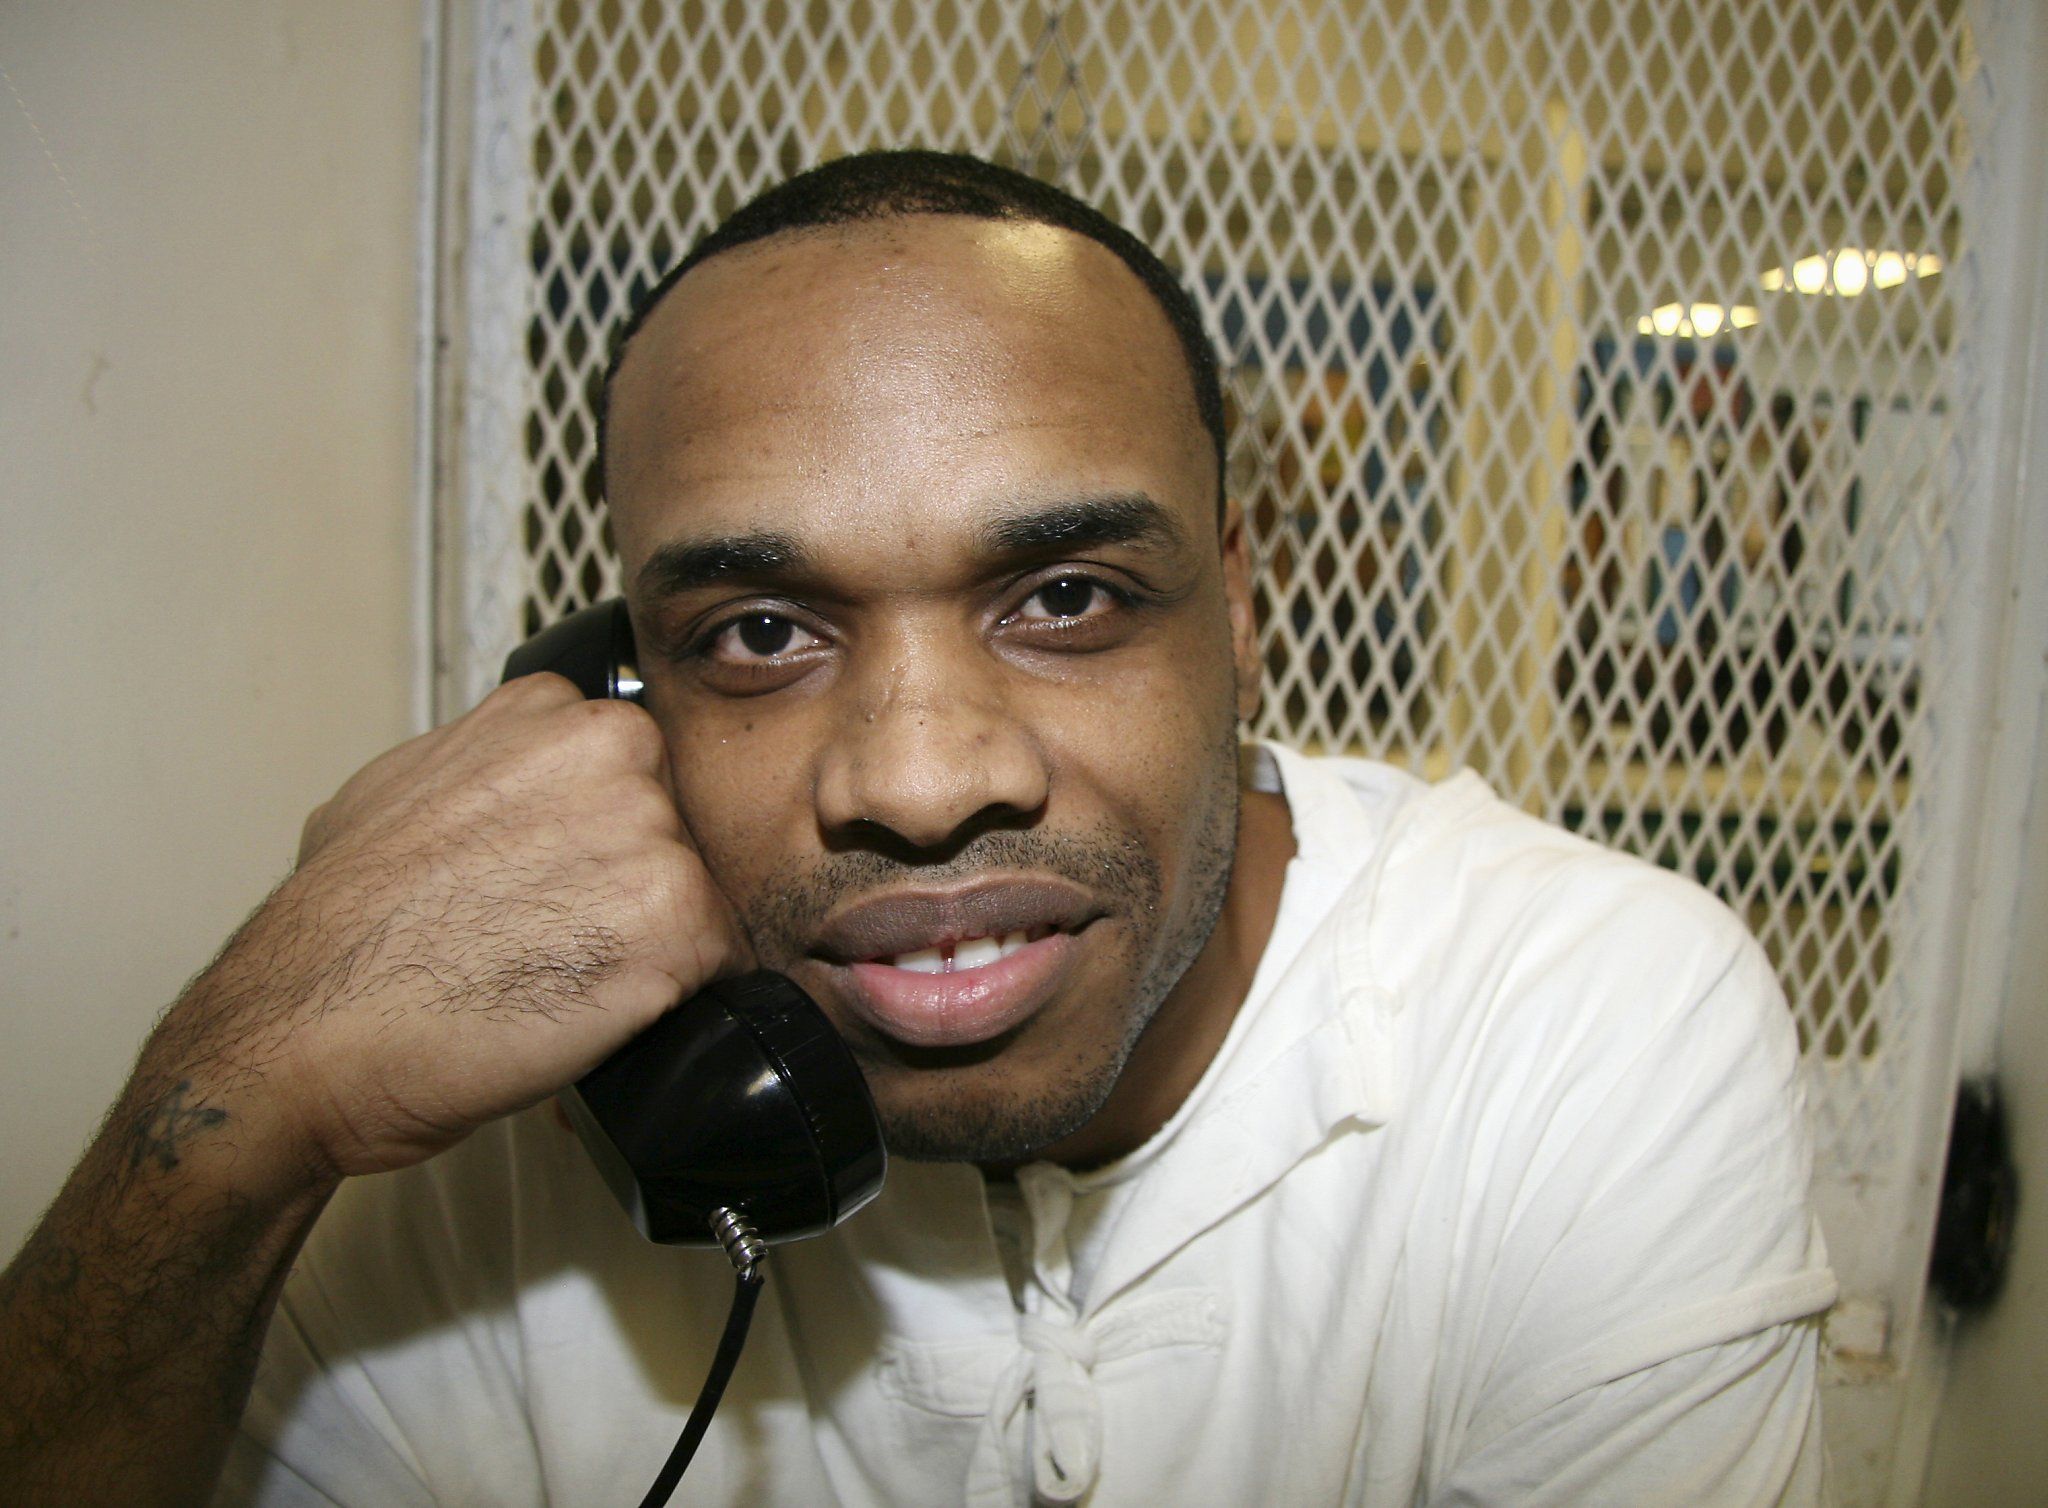 San Antonio killer on death row denied clemency, despite ...